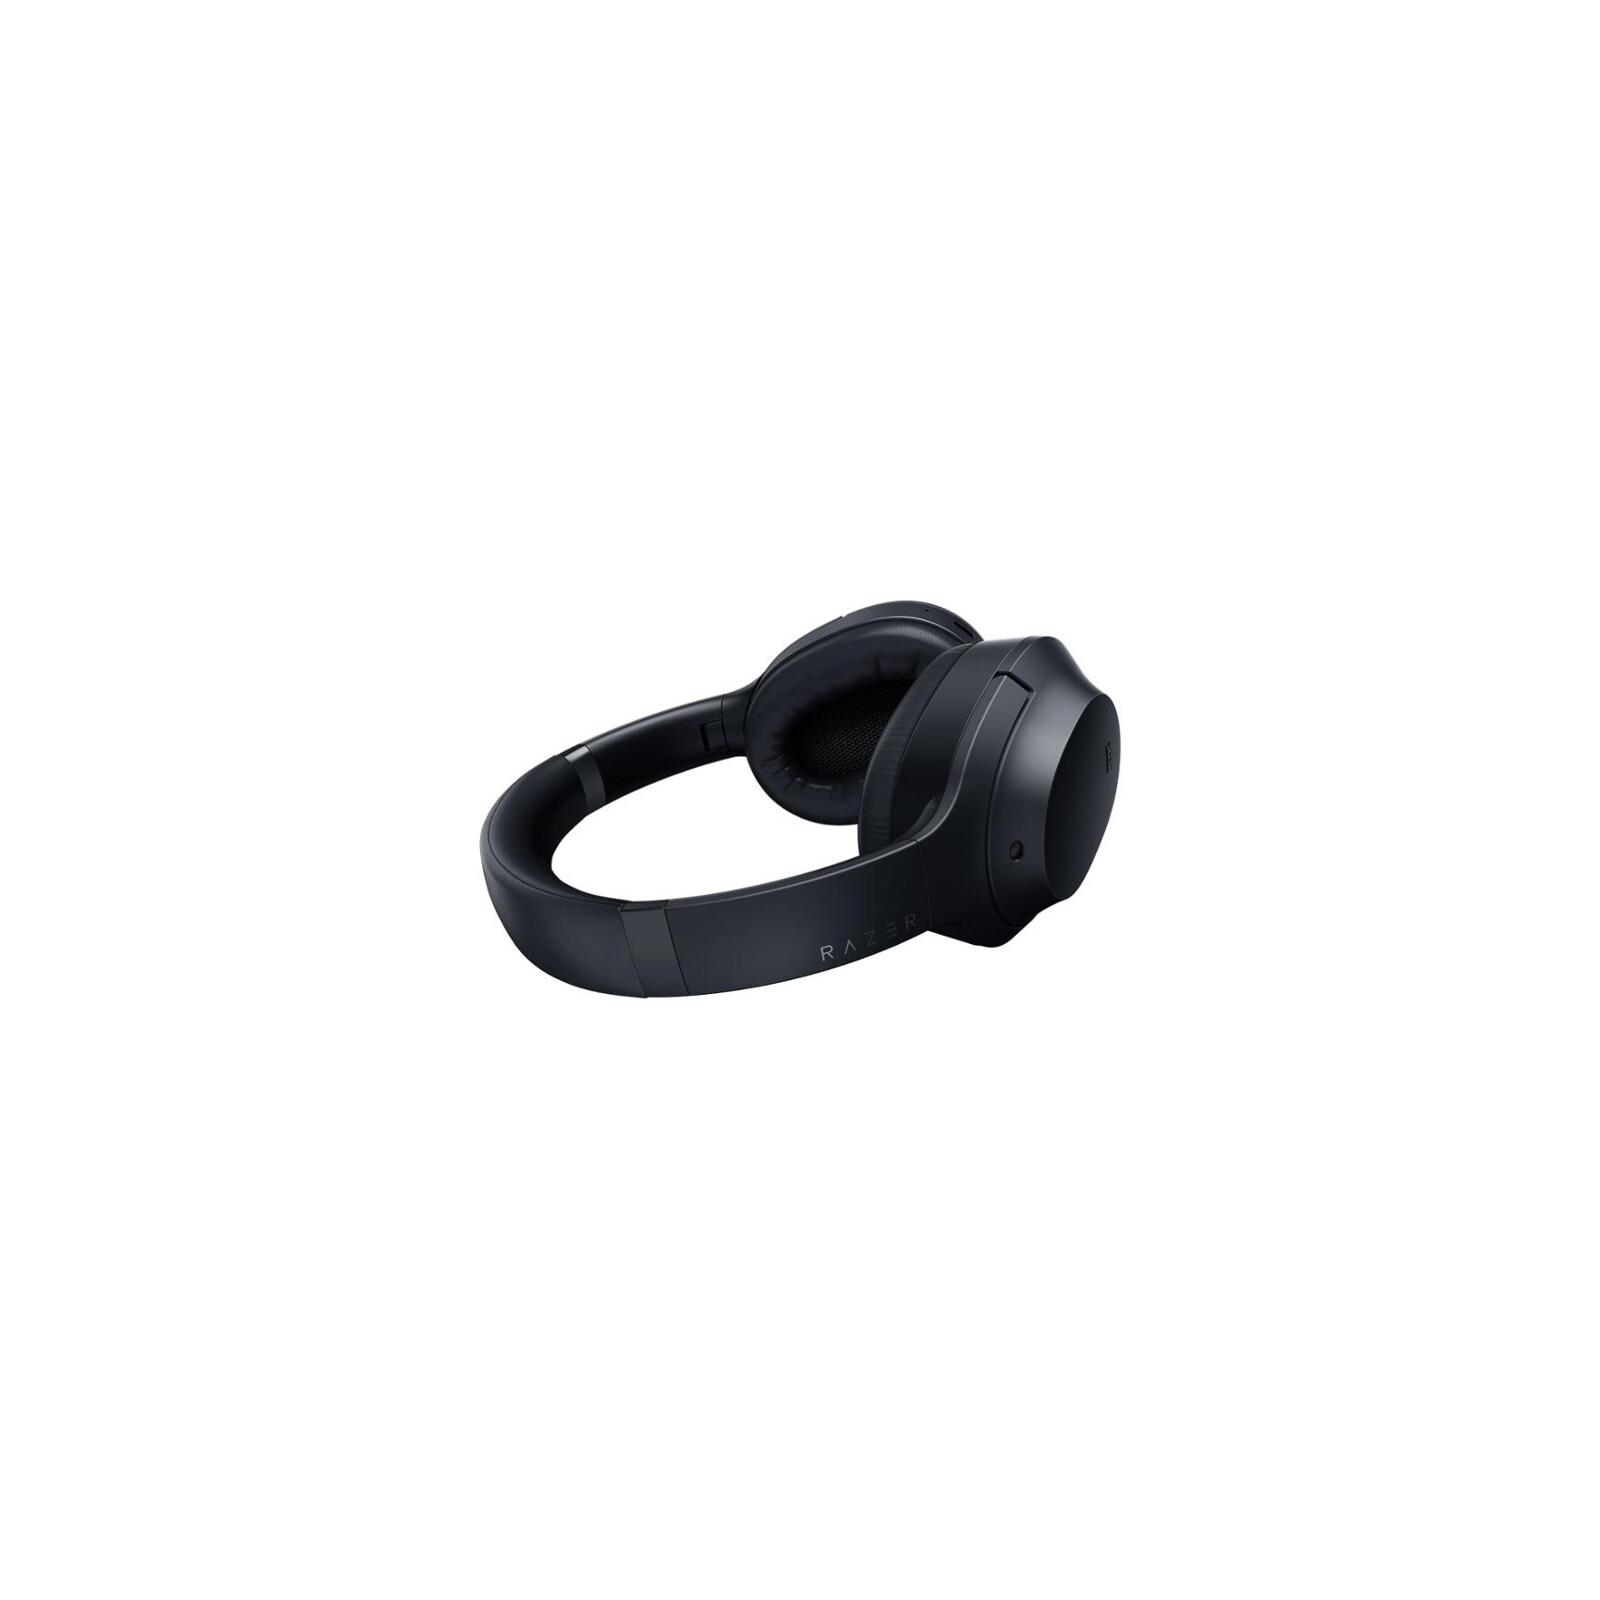 Razer Opus - Active Noice Cancellation Headset - Black